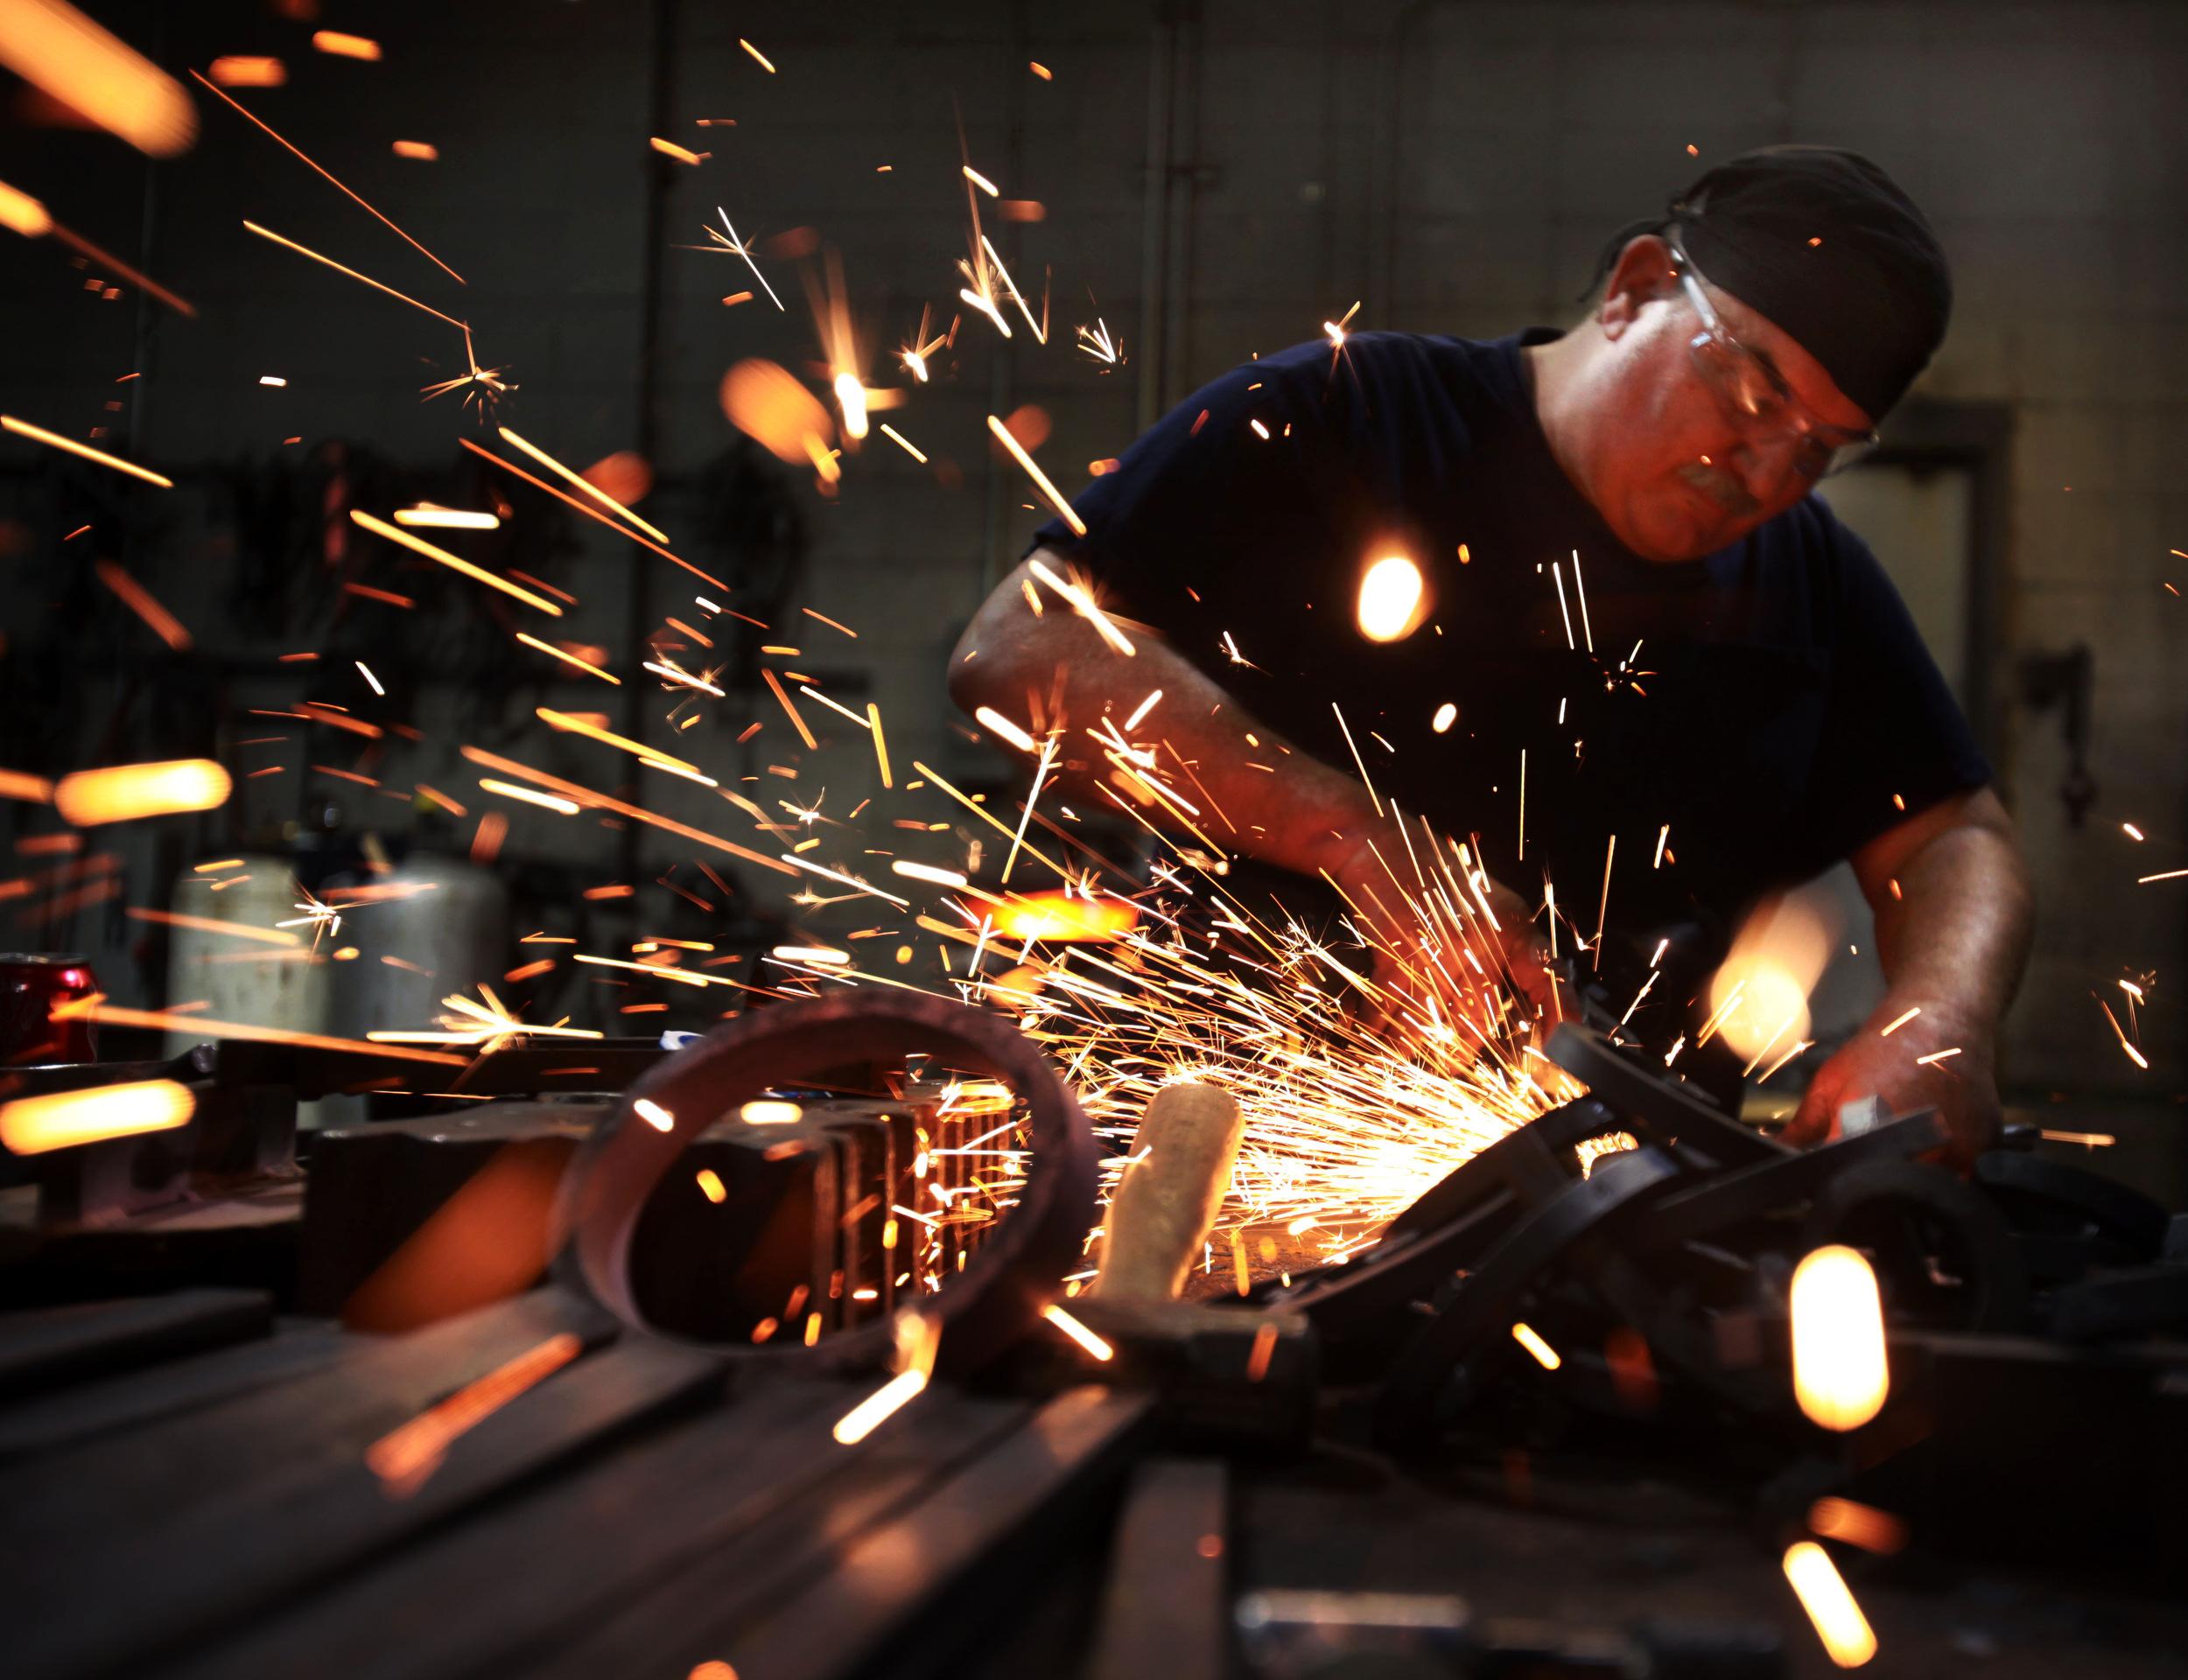 Lead Blacksmith Gene Hutto works at Herndon & Merry in Nashville, Tenn.